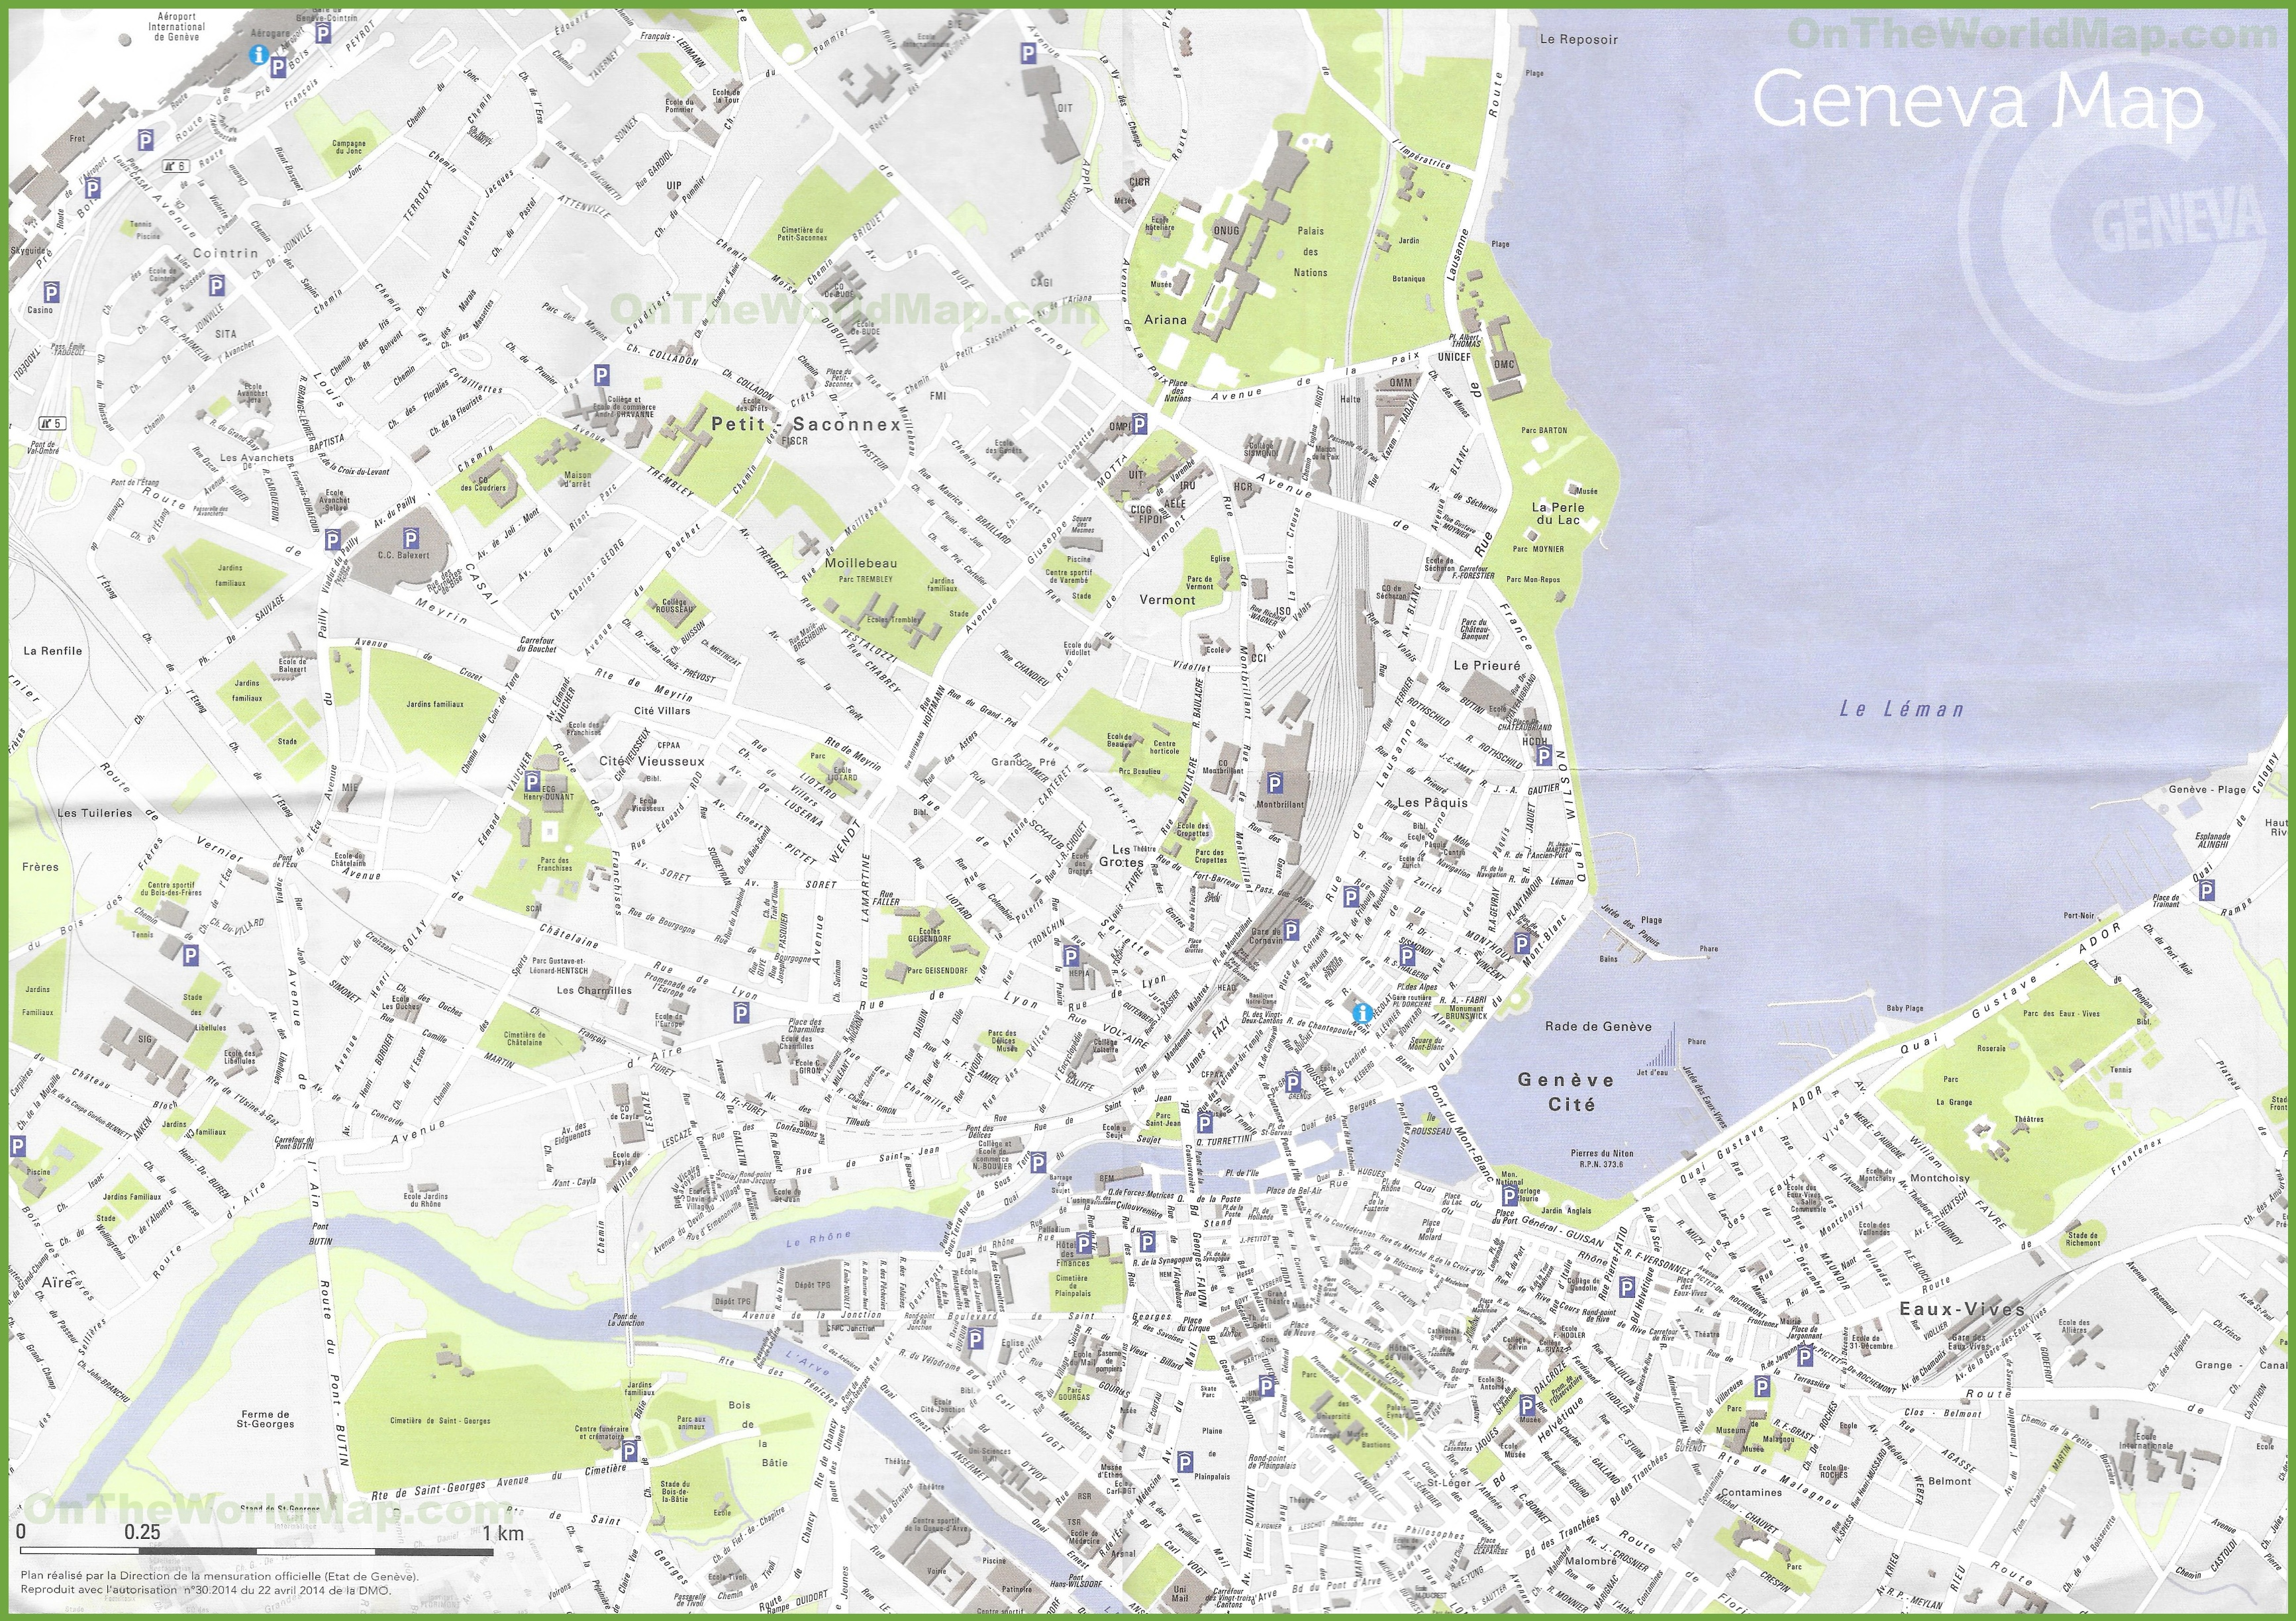 Large detailed map of Geneva on vienna map, lake geneva, genoa map, zurich map, wittenberg on map, munich map, helsinki map, trent map, lapland map, rhone river map, cadiz map, sardinia map, swiss map, the hague map, africa map, singapore map, corsica map, europe map, john calvin, switzerland map, sweden map, zürich, ashtabula map,